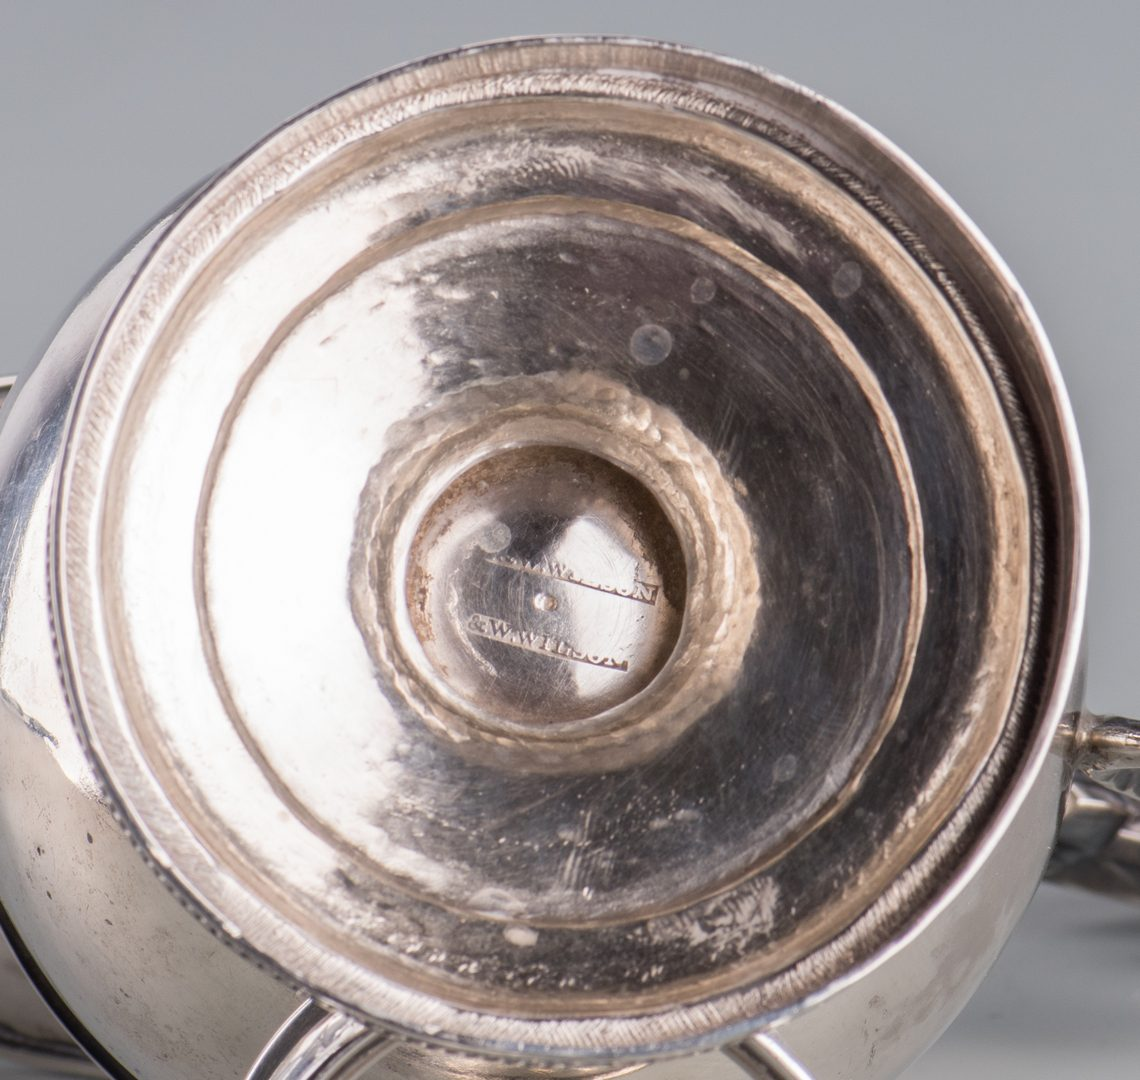 Lot 130: Coin silver inc. F.H. Clark, 9 pcs